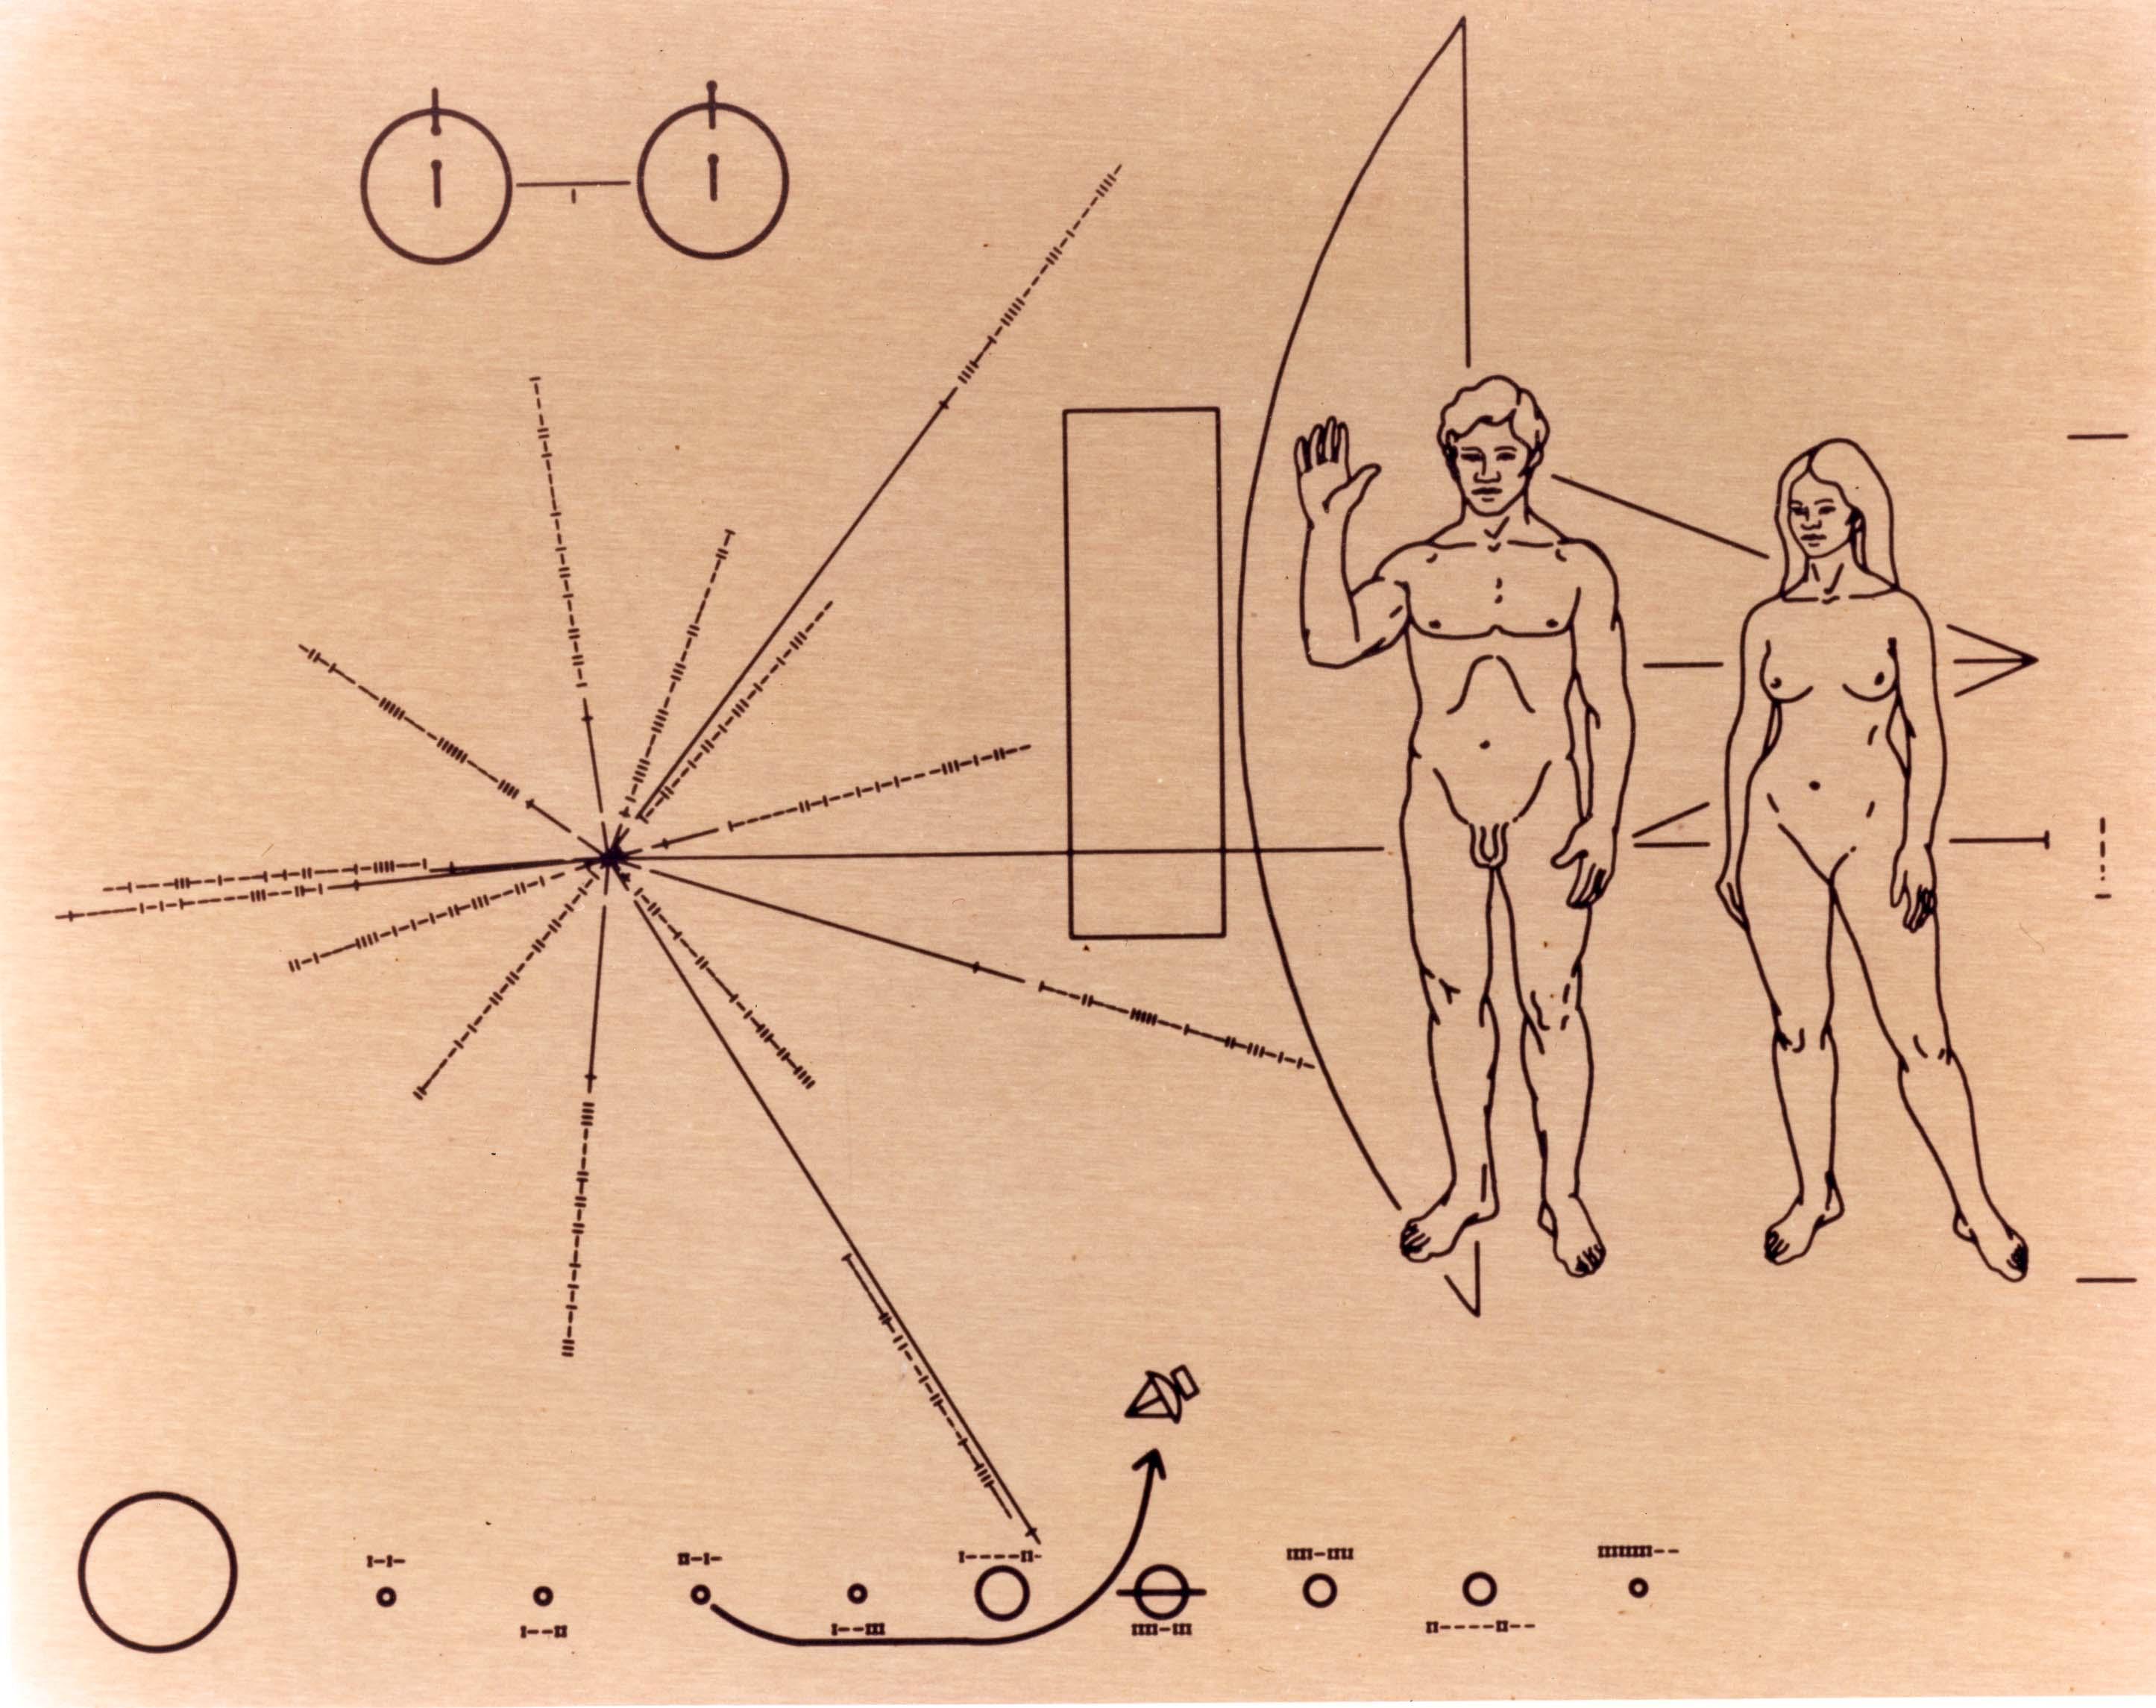 Les dessins dans Pioneer 10